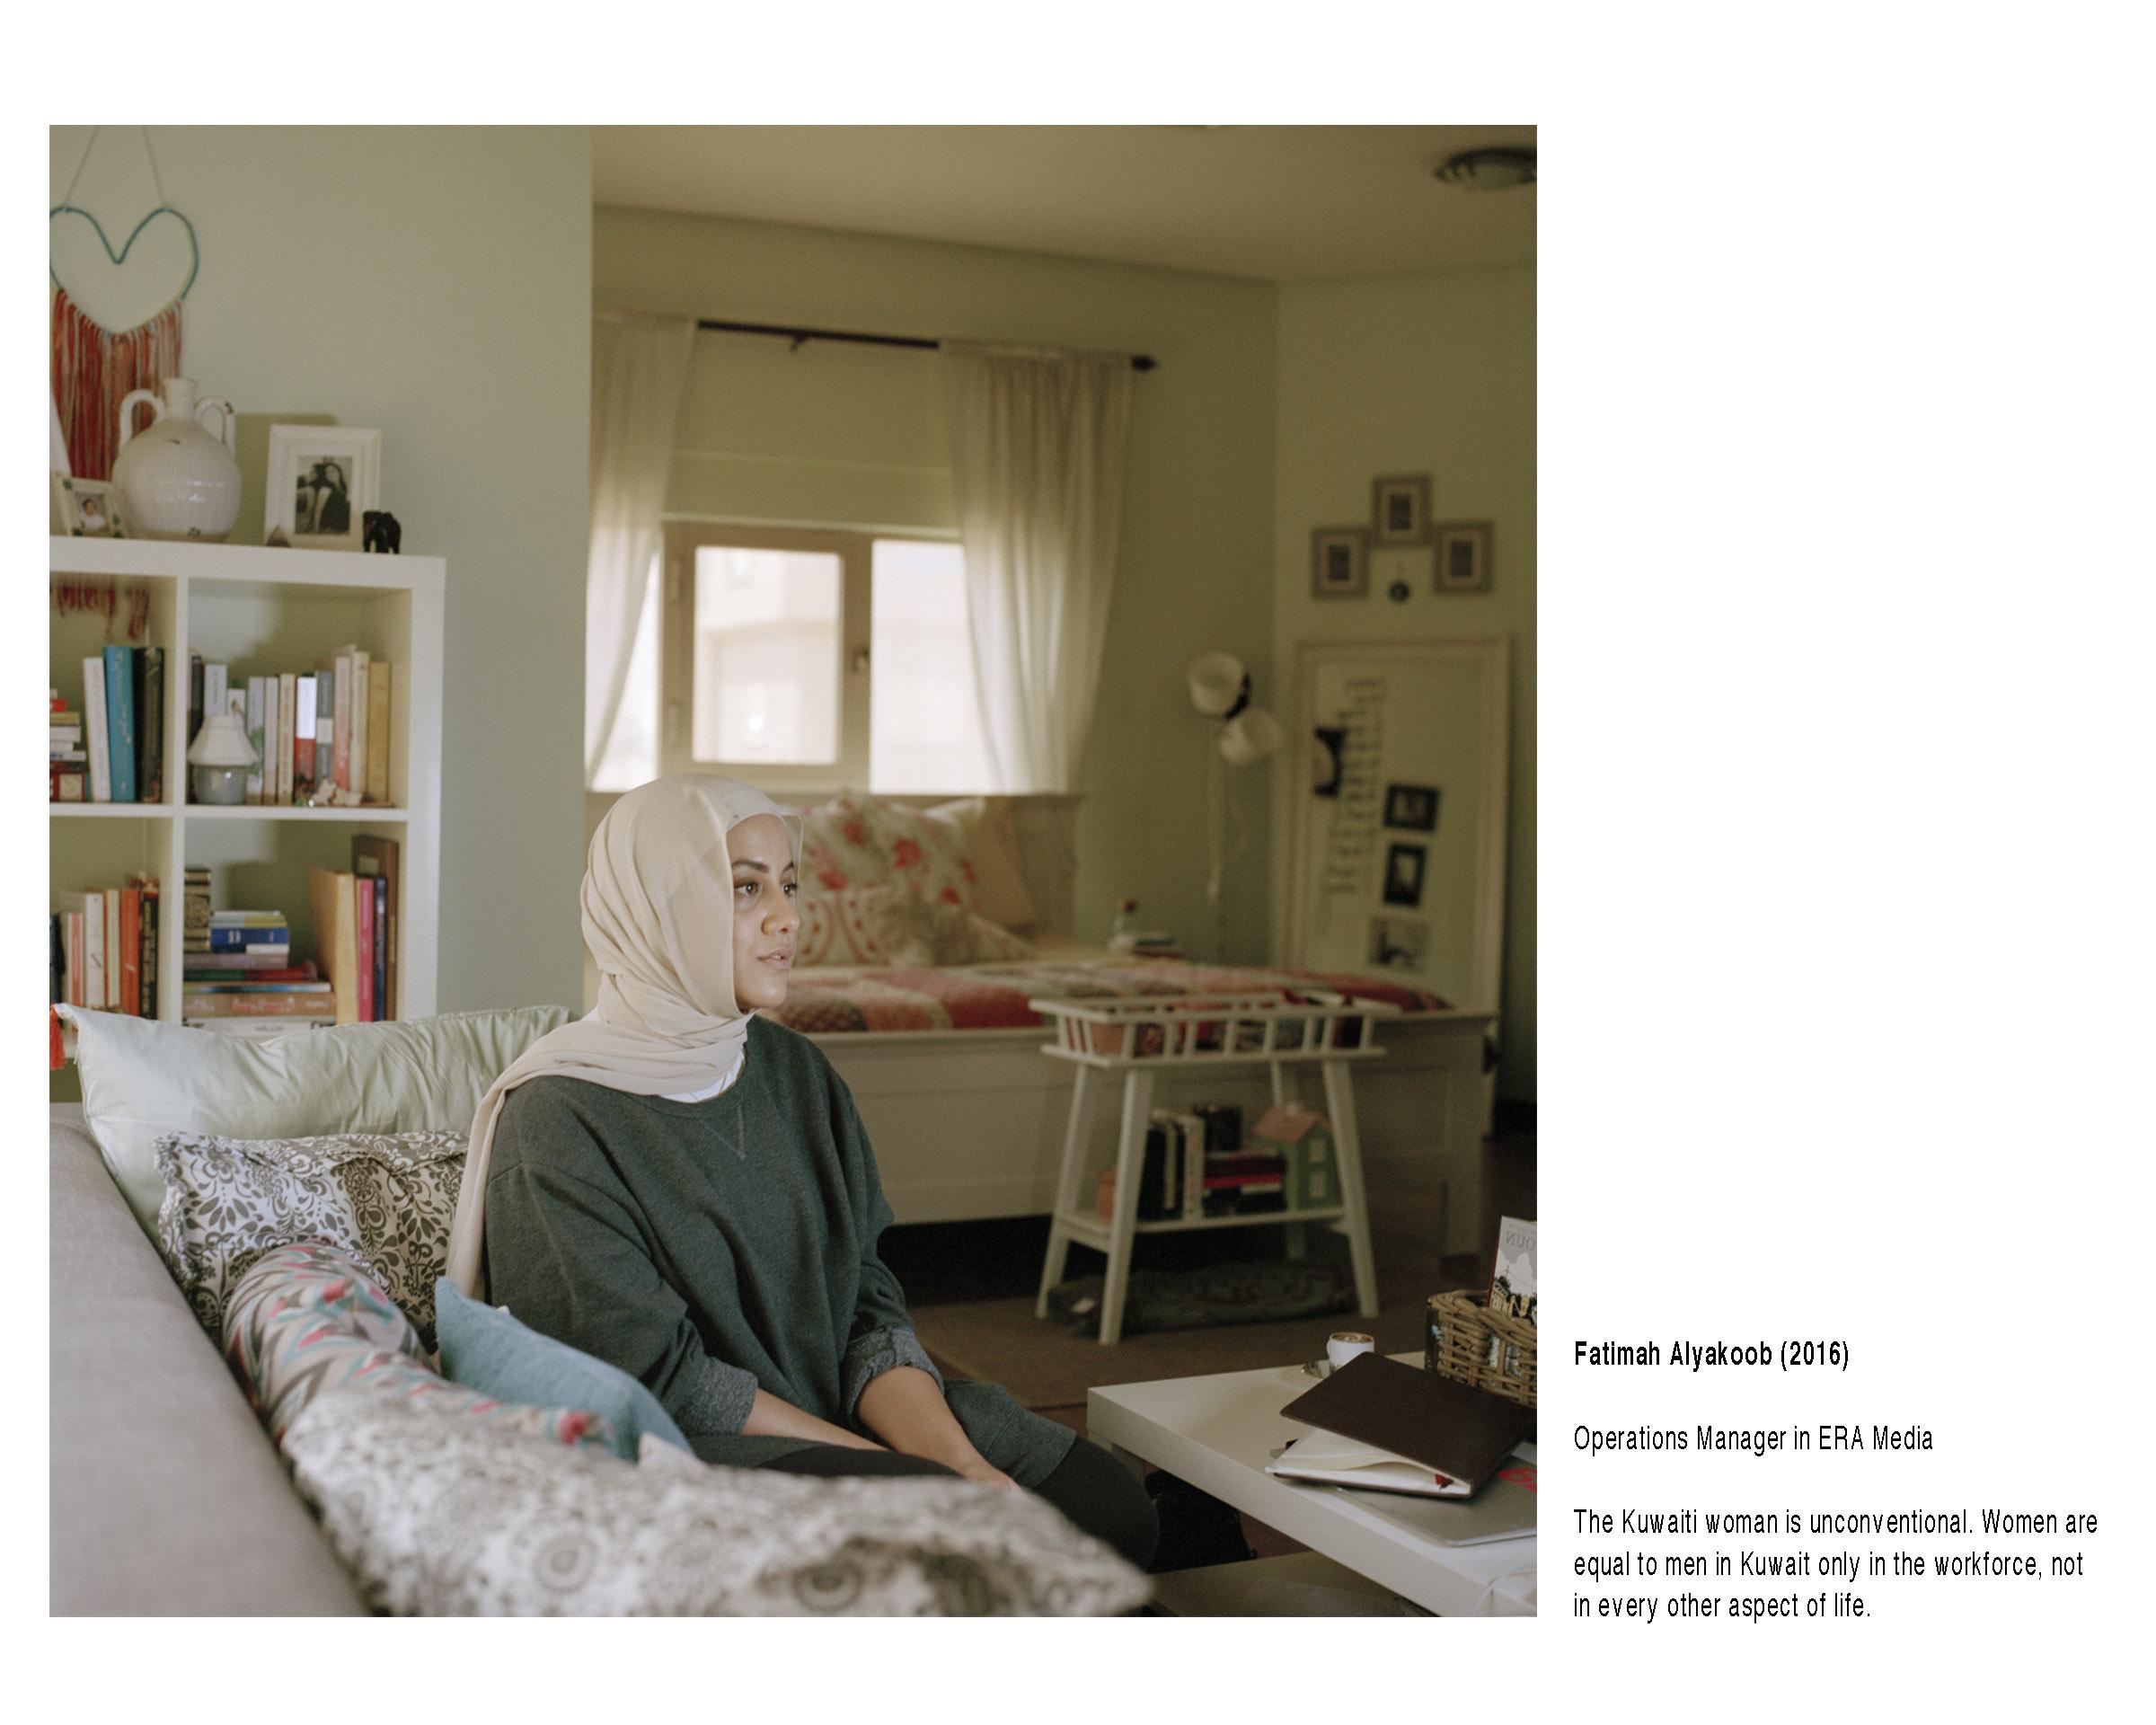 Fatimah Alyakoob.jpg